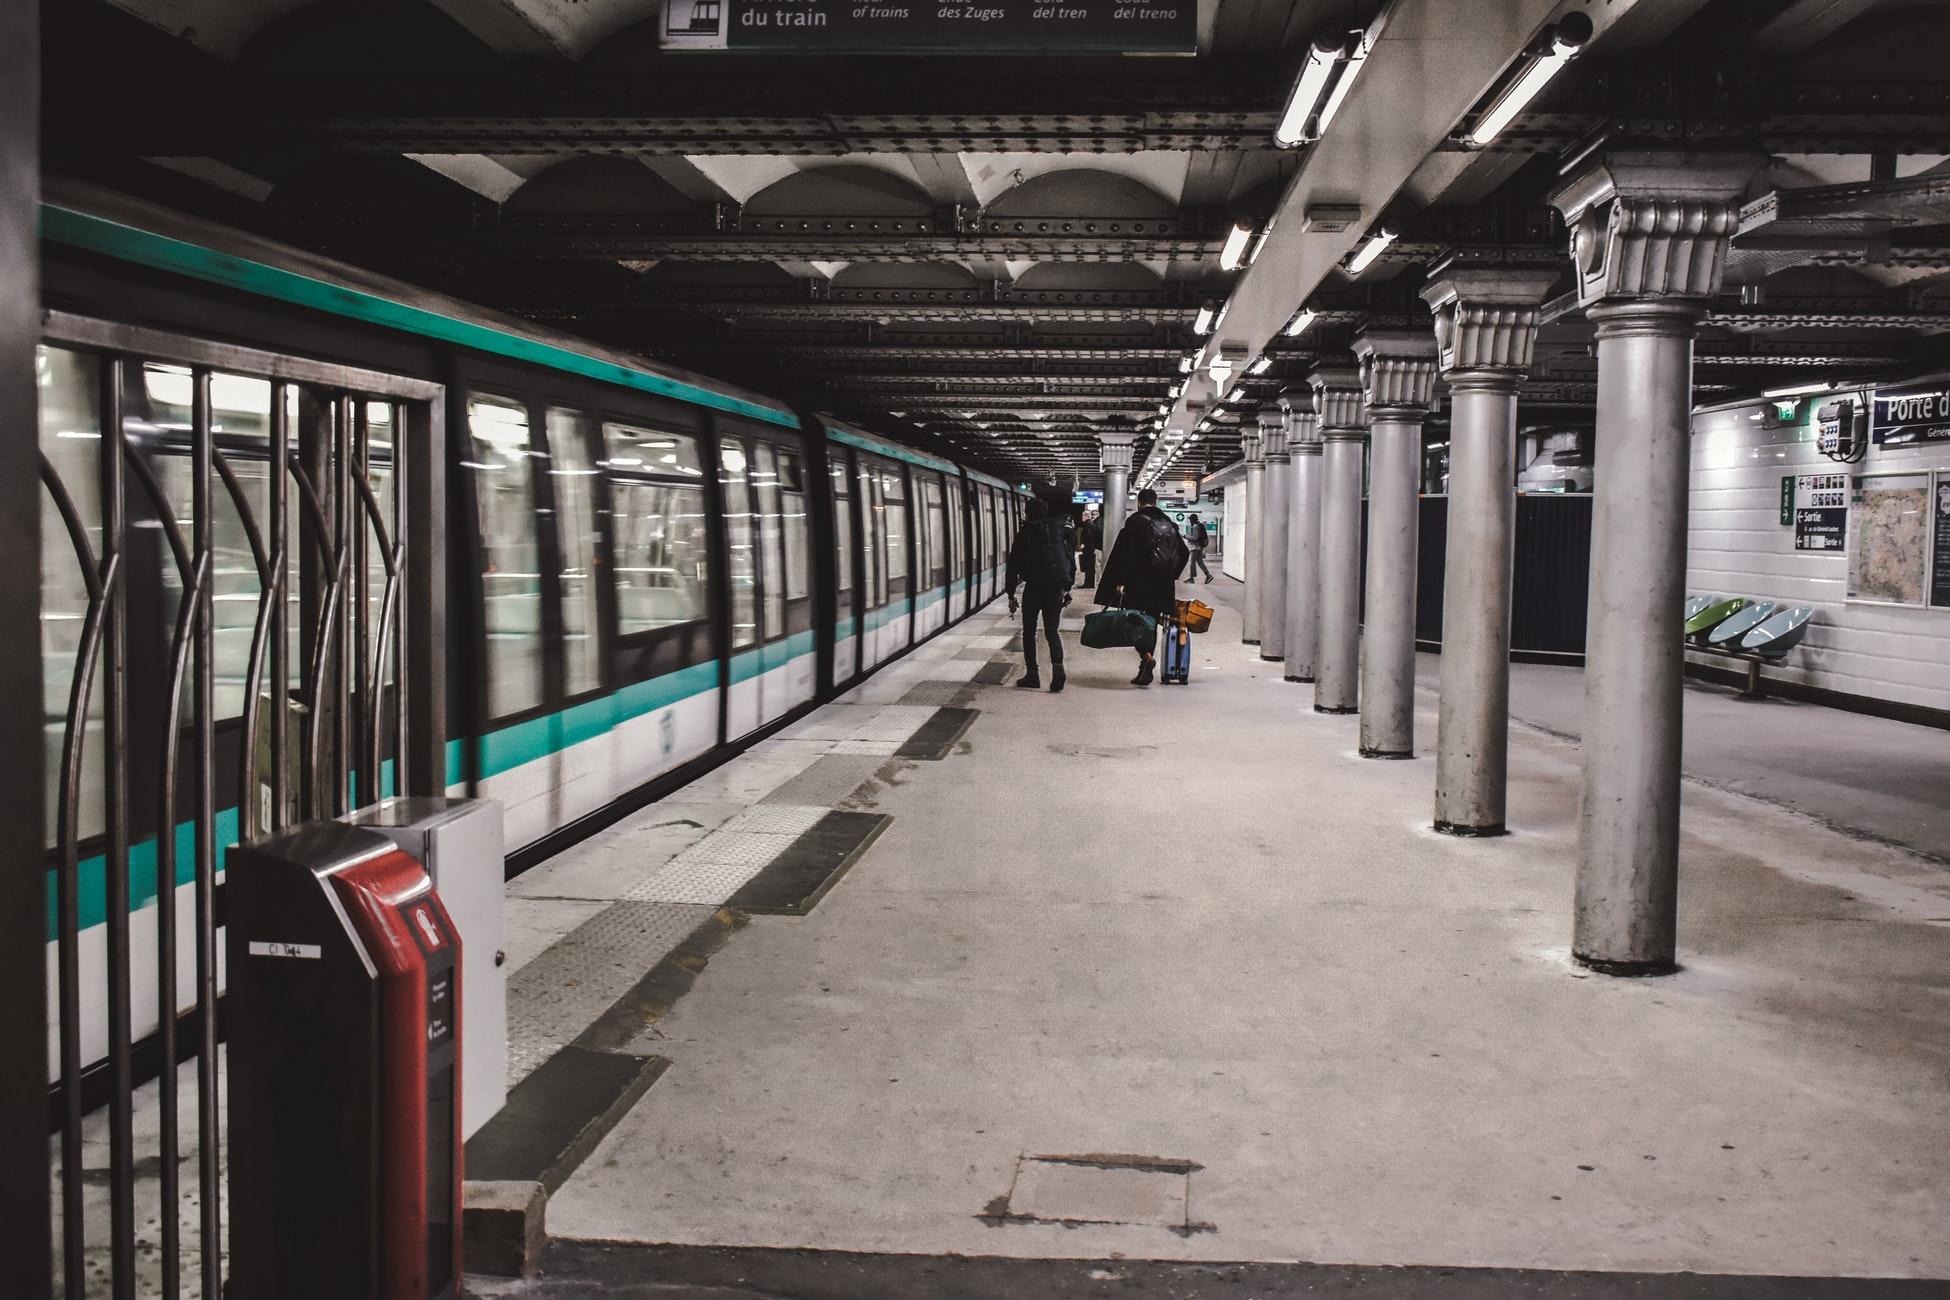 métro butrfly